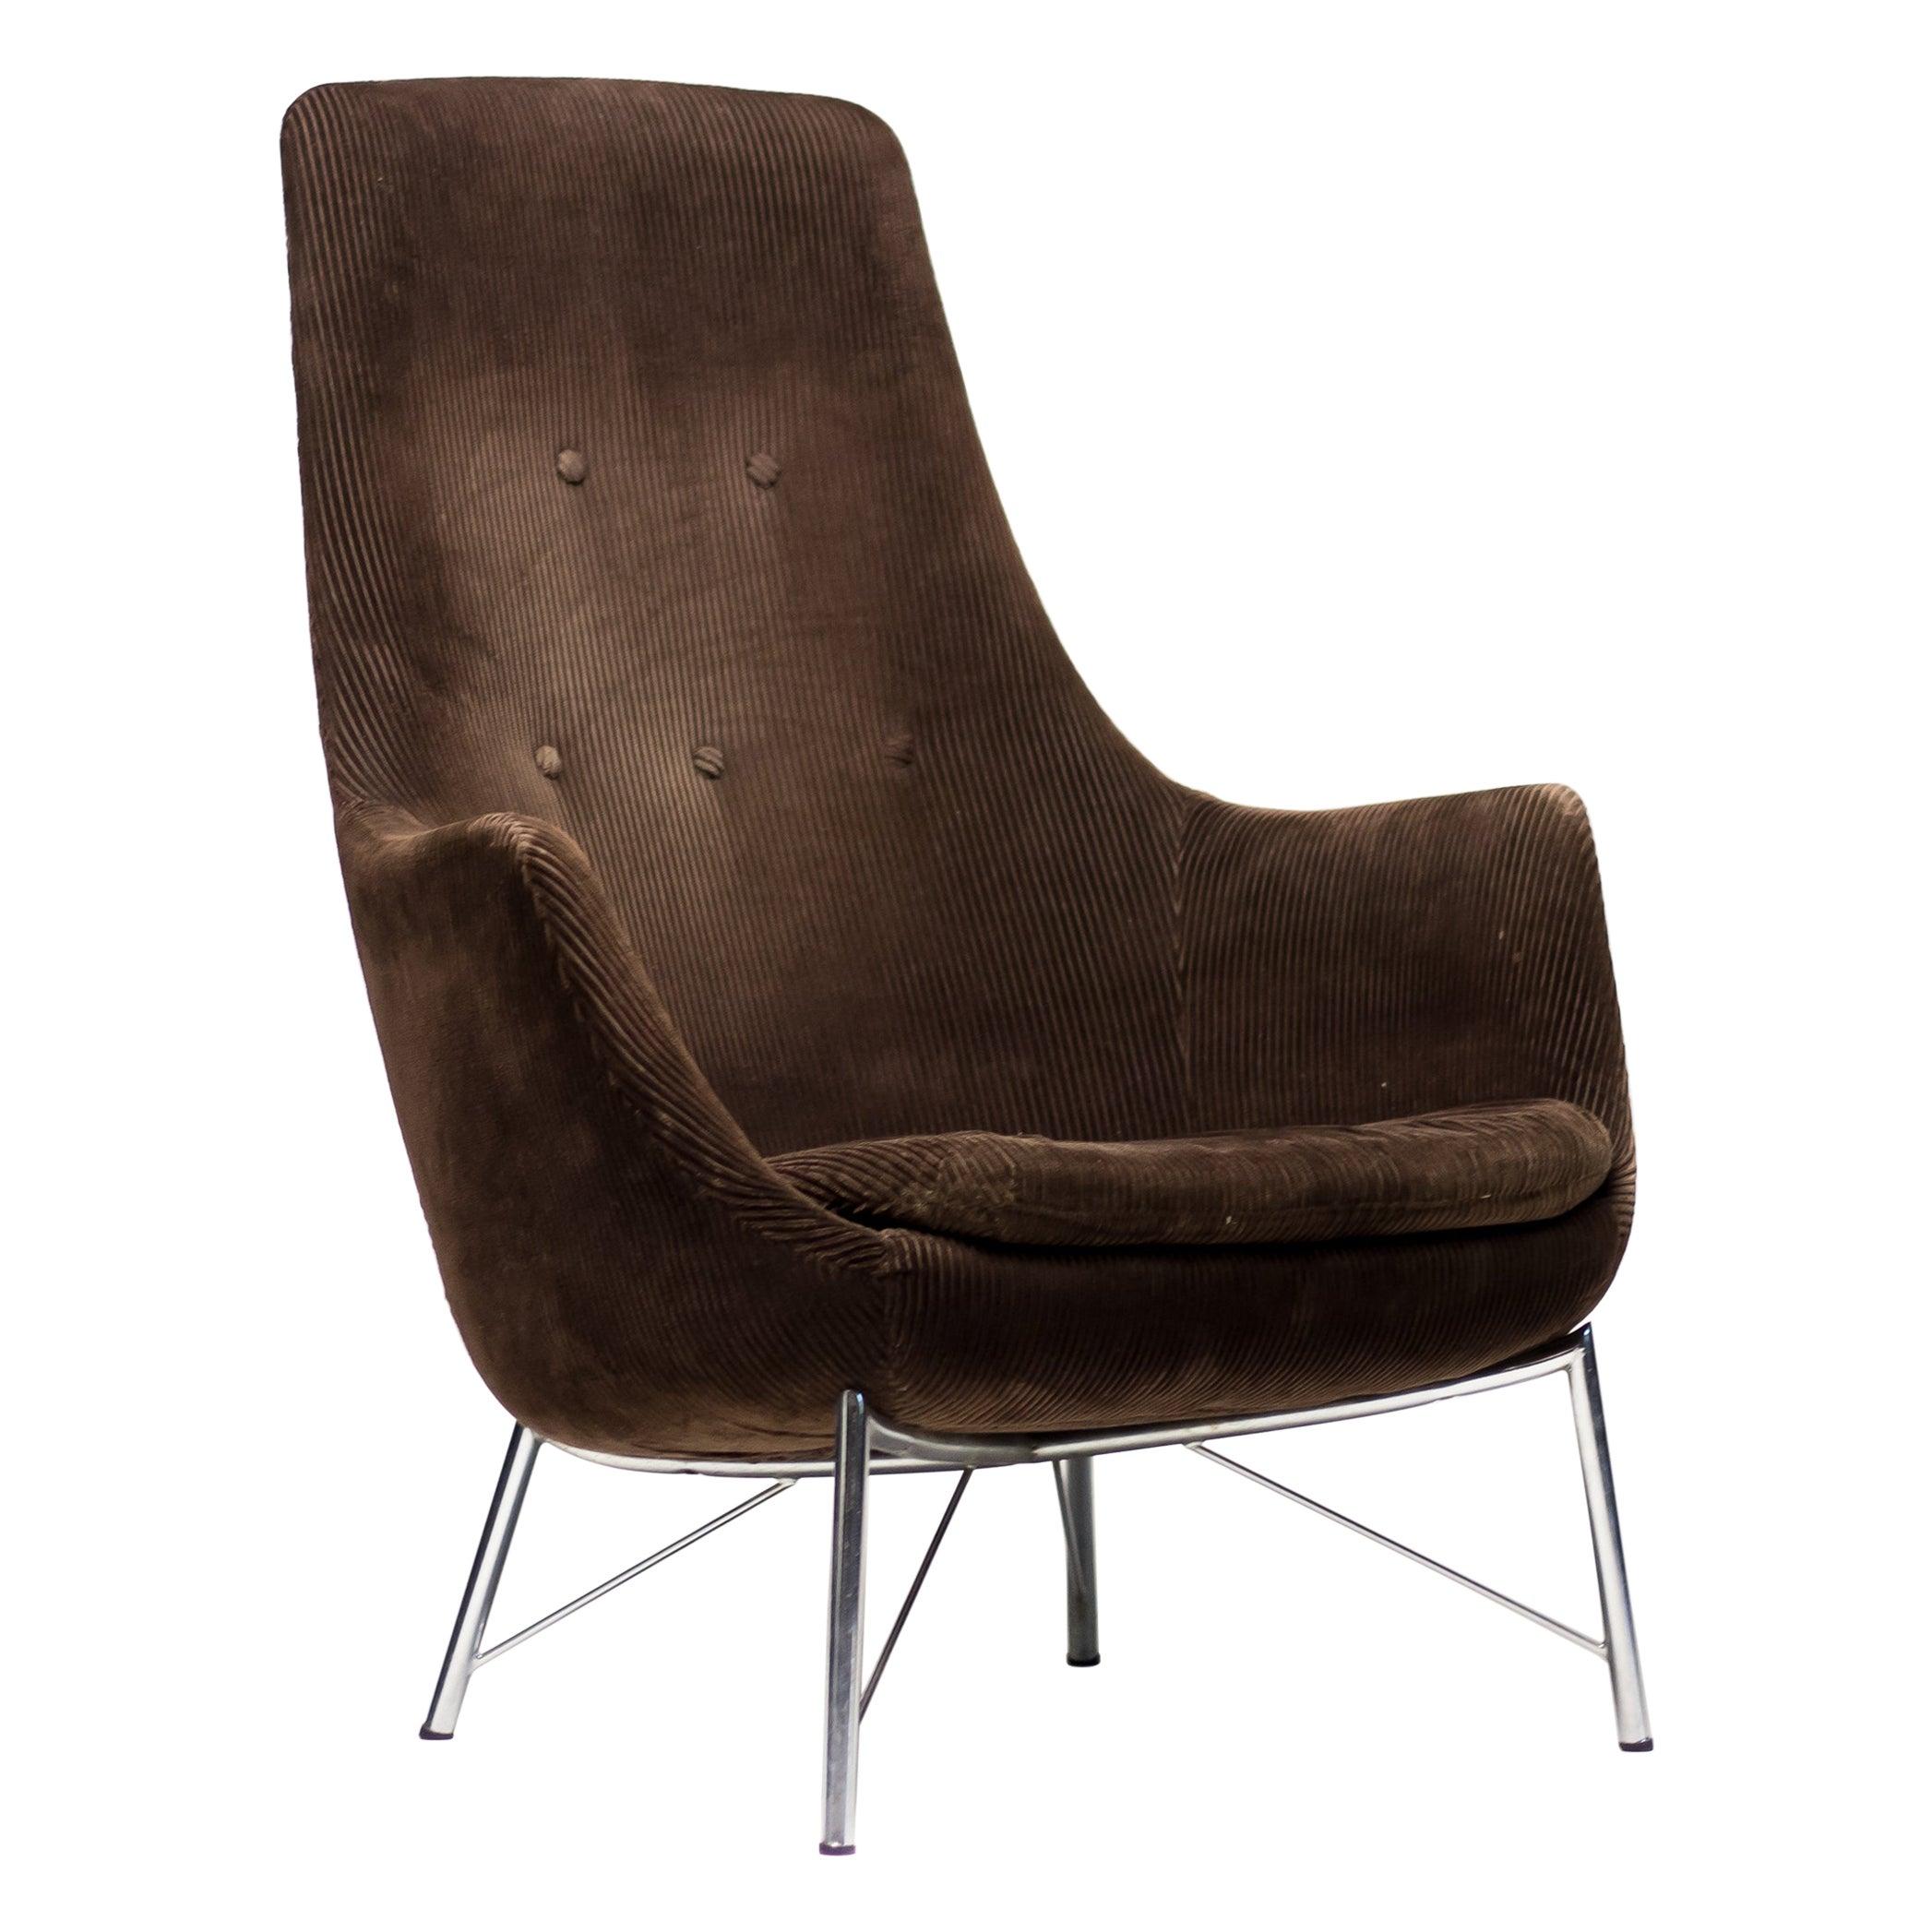 Pastoe FM31 Lounge Chair by Karl Ekselius